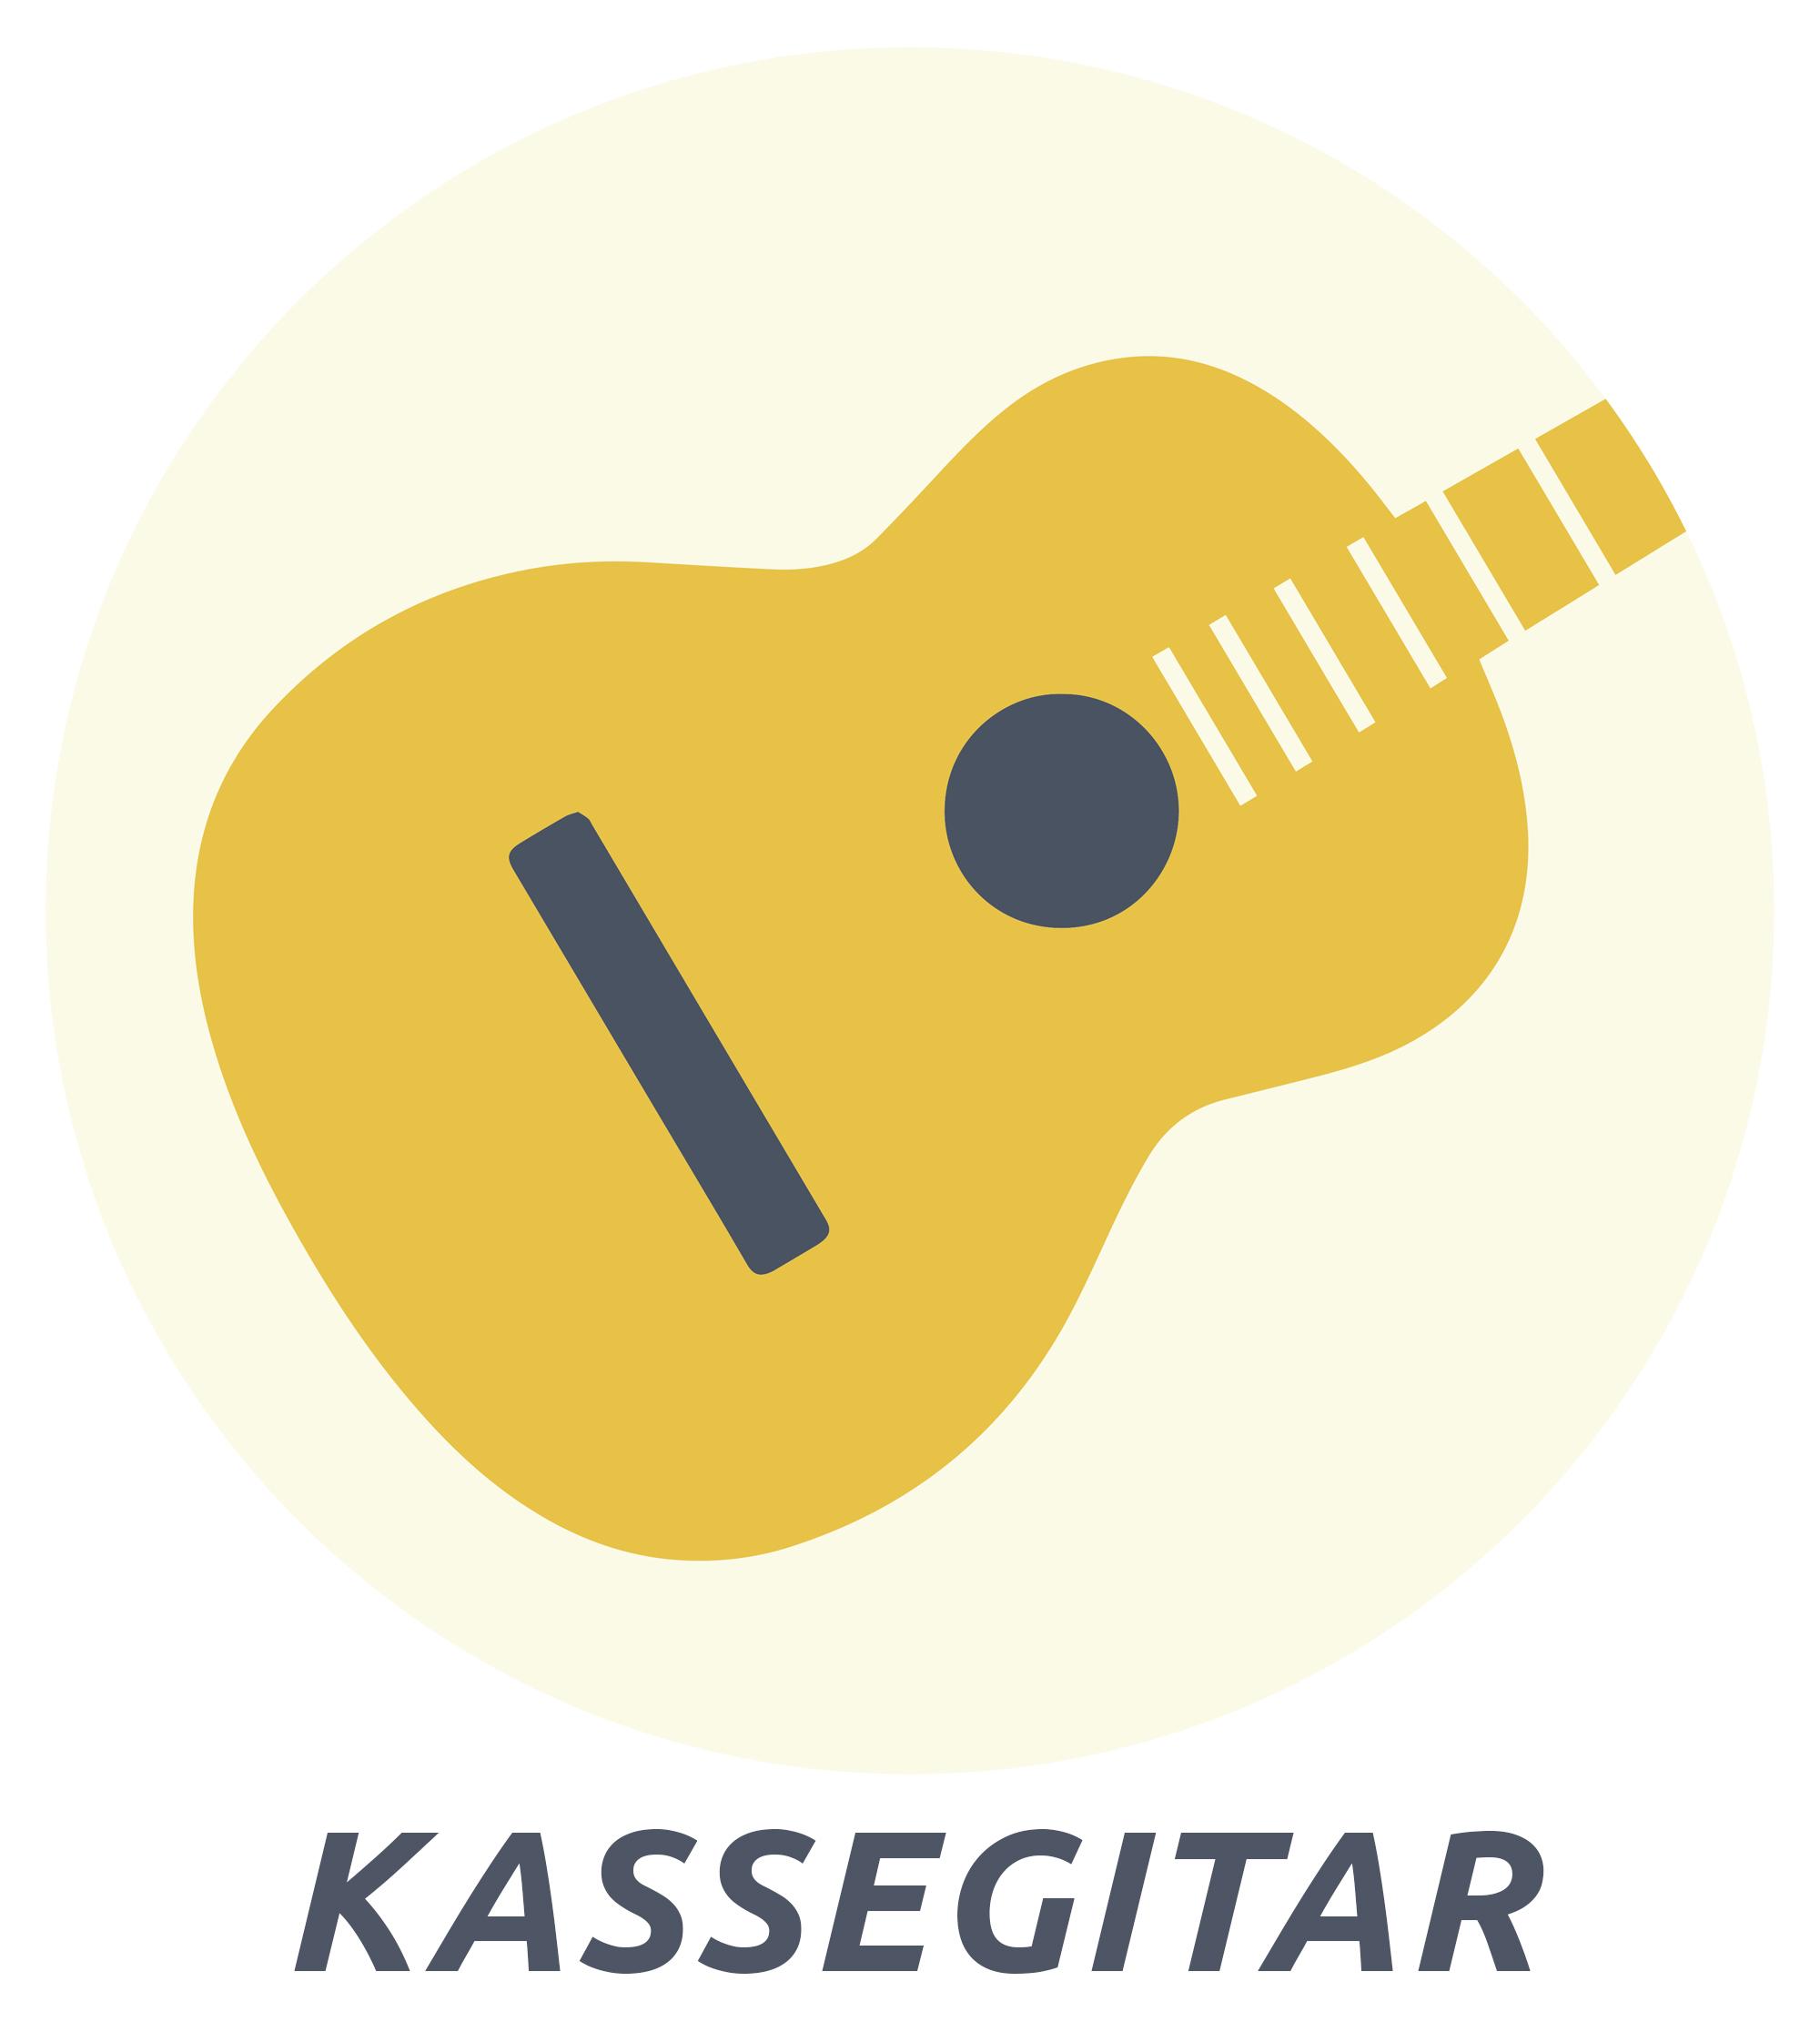 Kassegitar